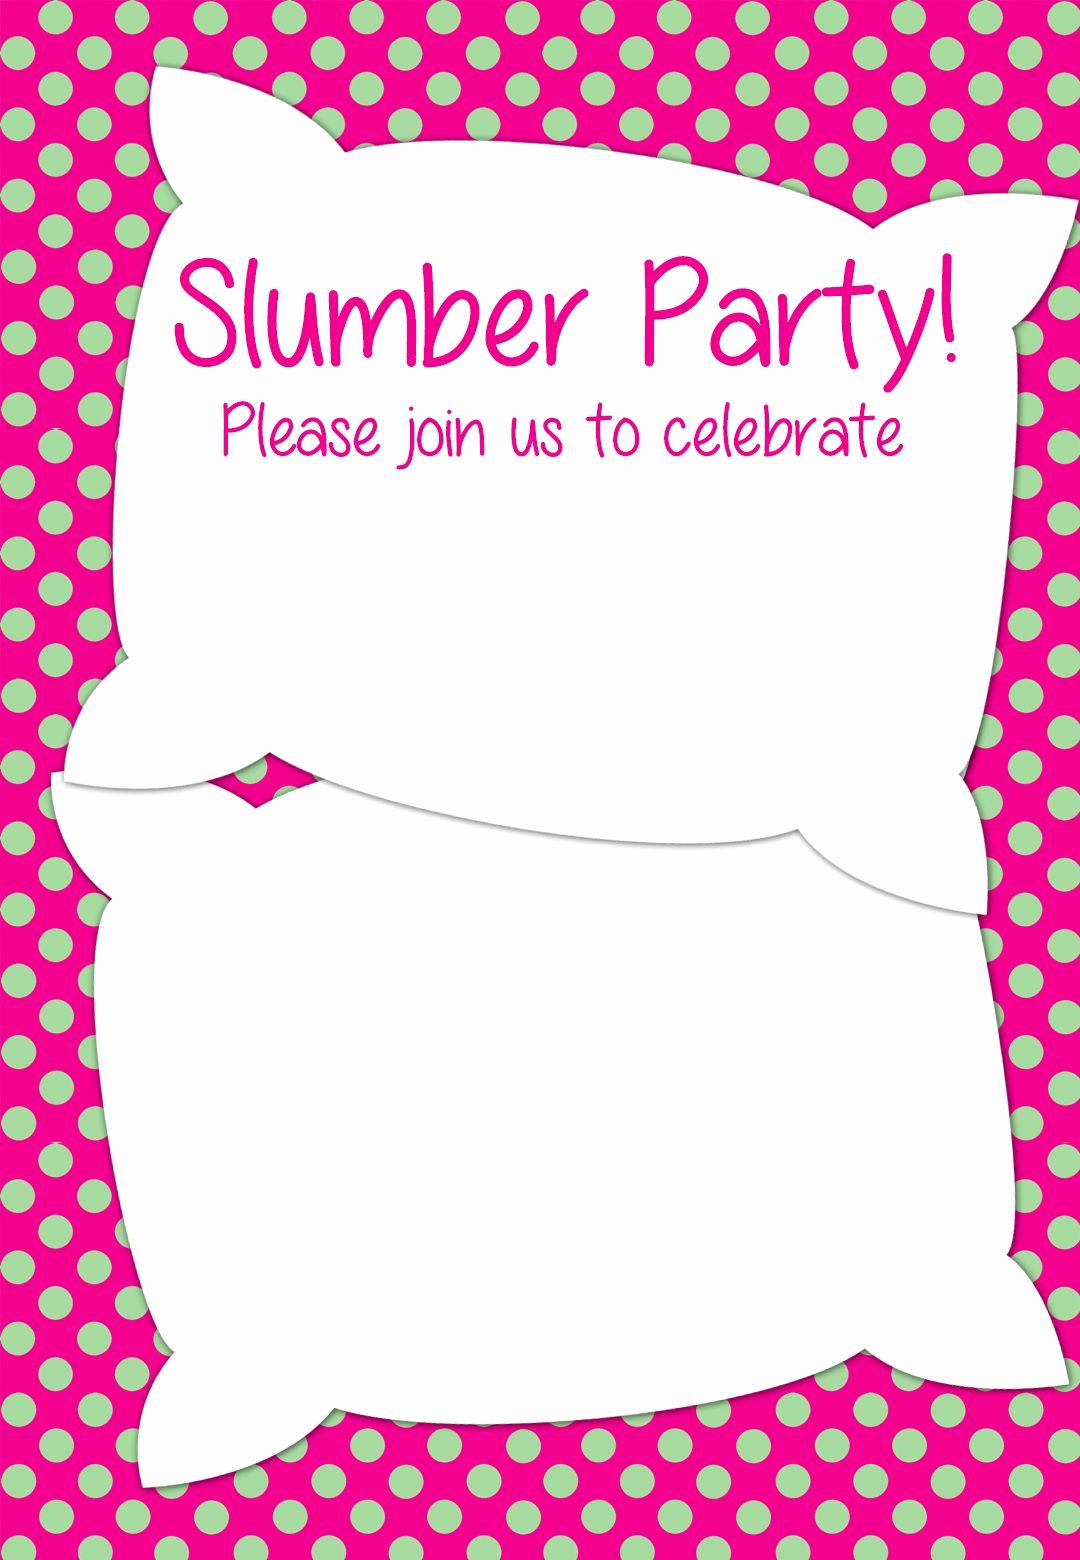 Free Sleepover Invitation Template Inspirational Free Printable Slumber Party Invitation